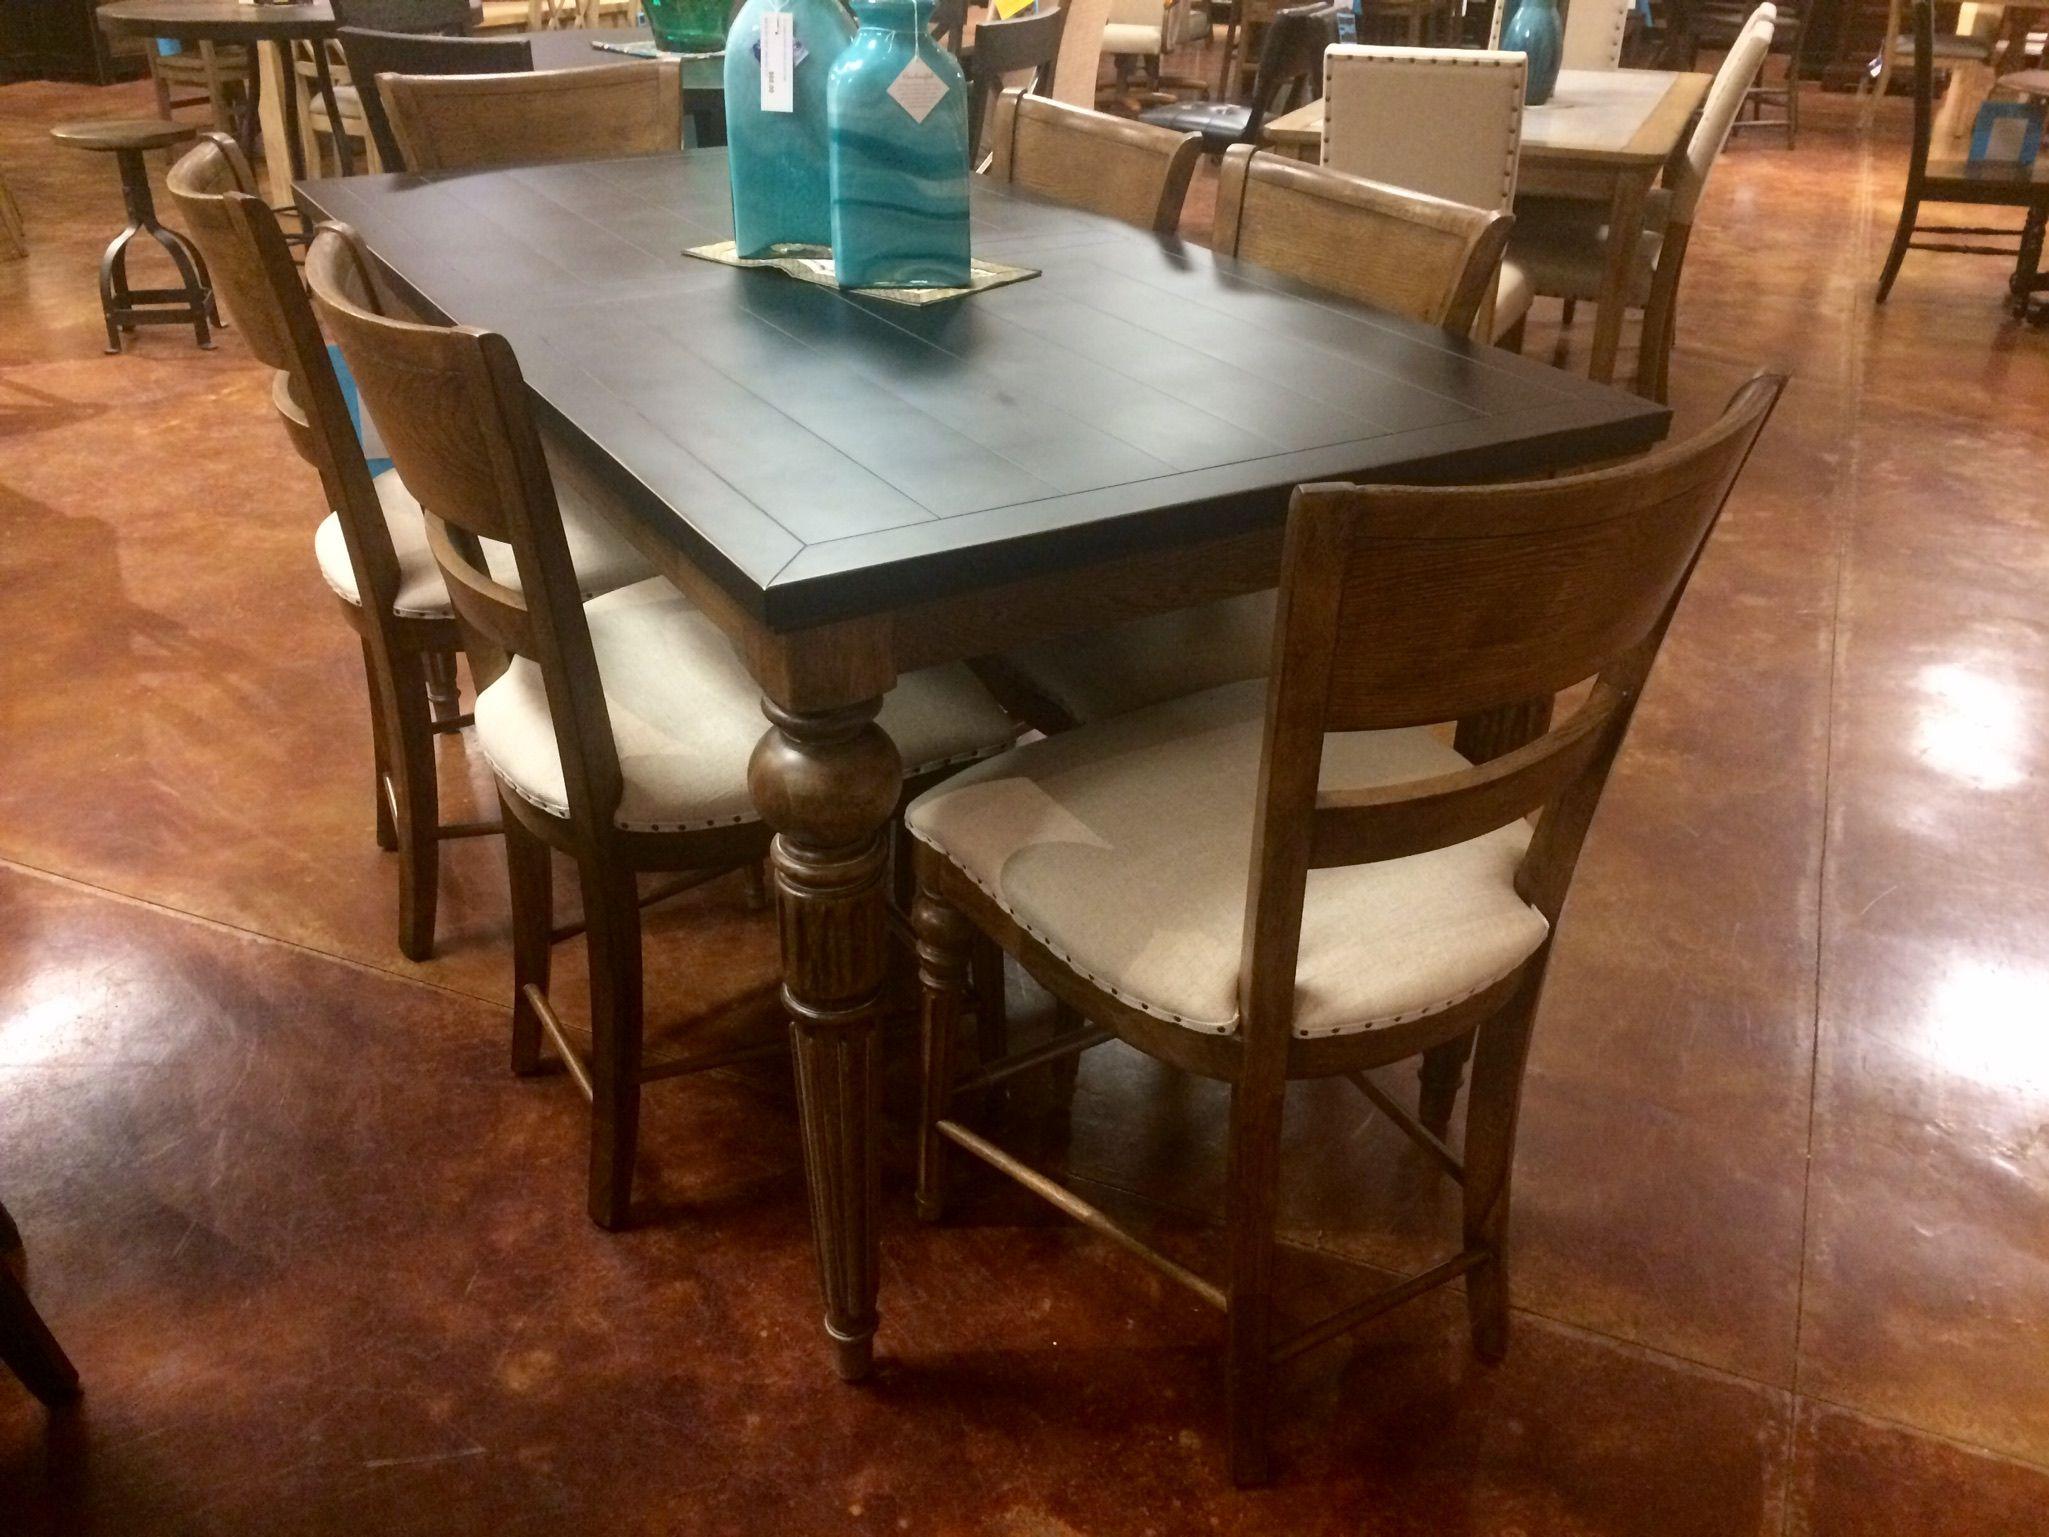 Awesome Universal Furniture At Harris Furniture In Jonesboro, AR